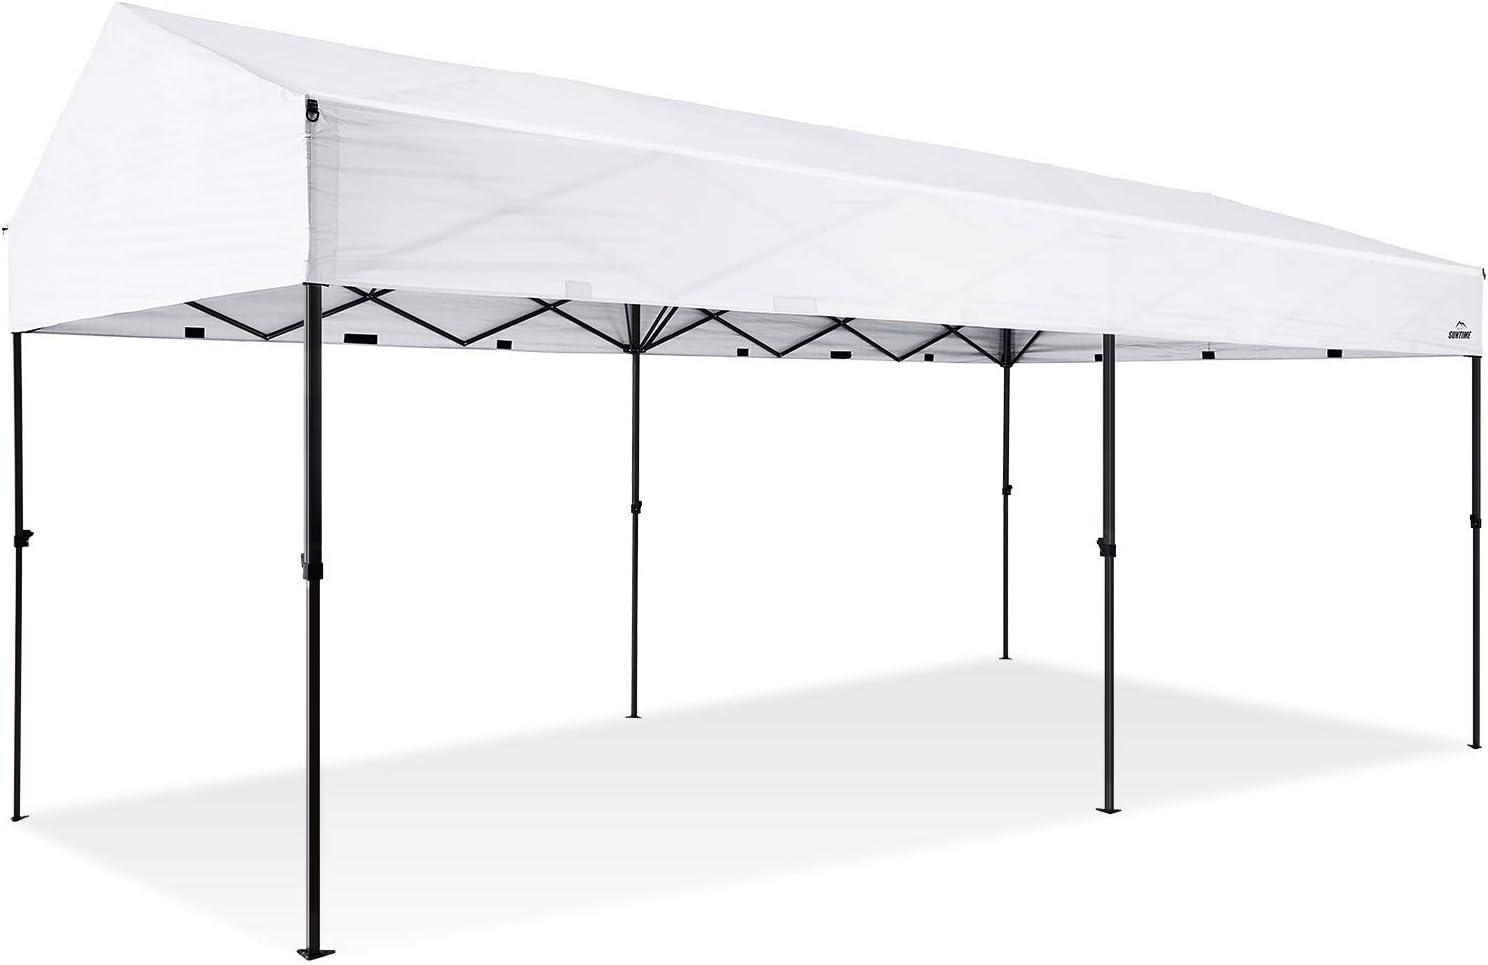 AC63200 Sunncamp Tent /& Awning Tidy 131cm x 48cm